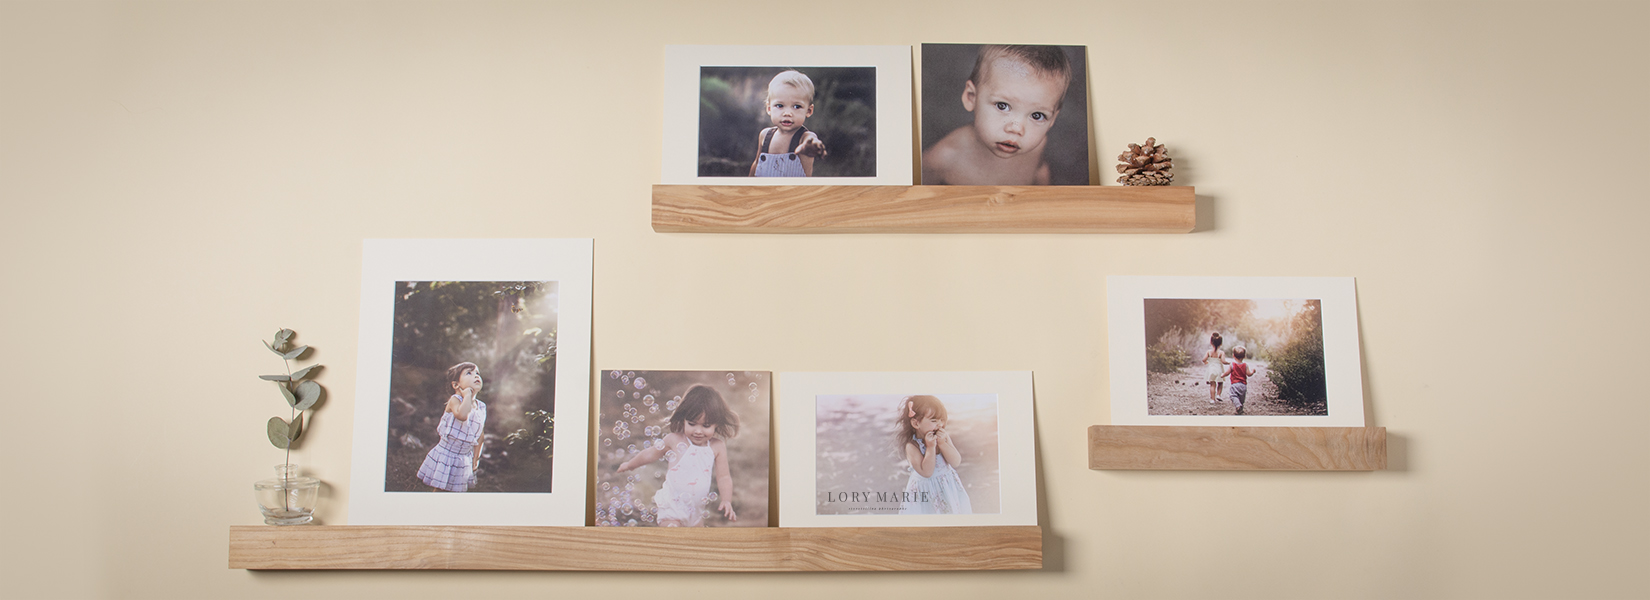 Wood ledge displays for professional photographers